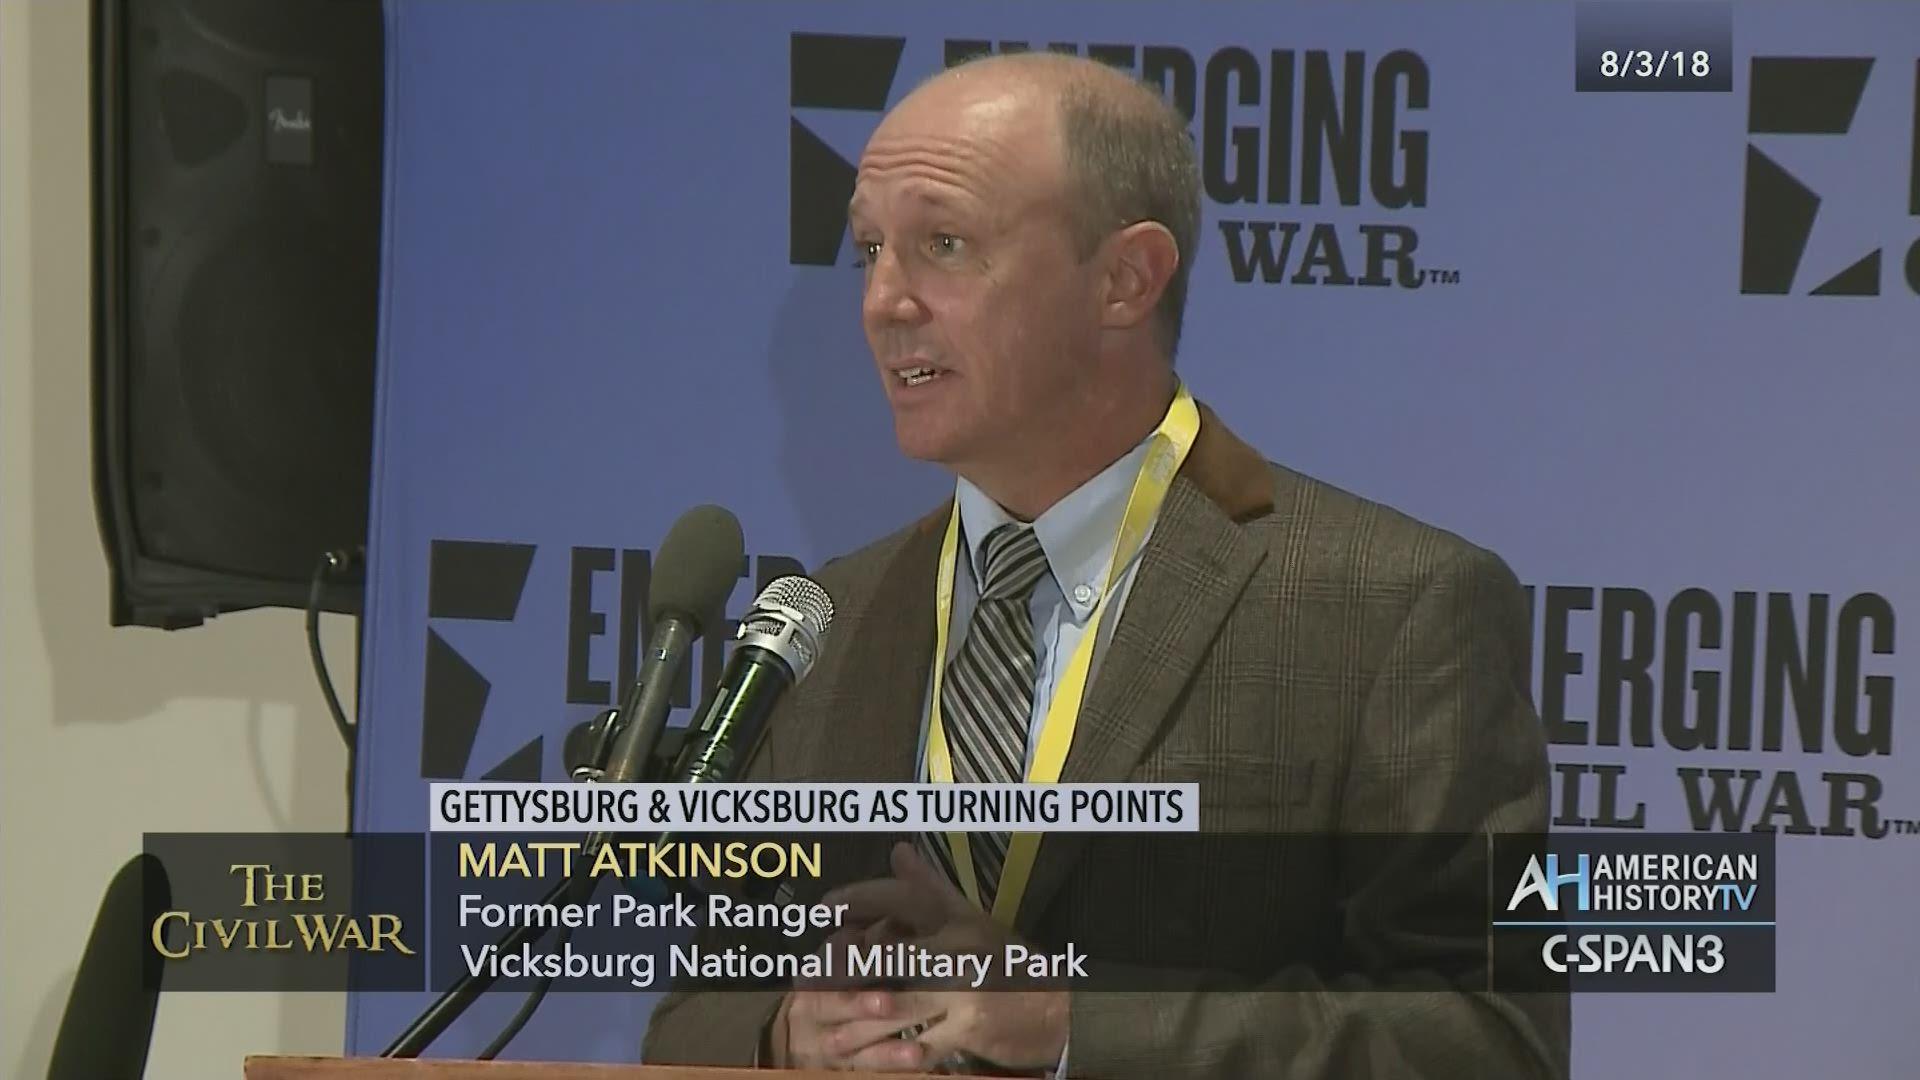 Gettysburg Vicksburg Turning Points Aug 3 2018 Video C Span